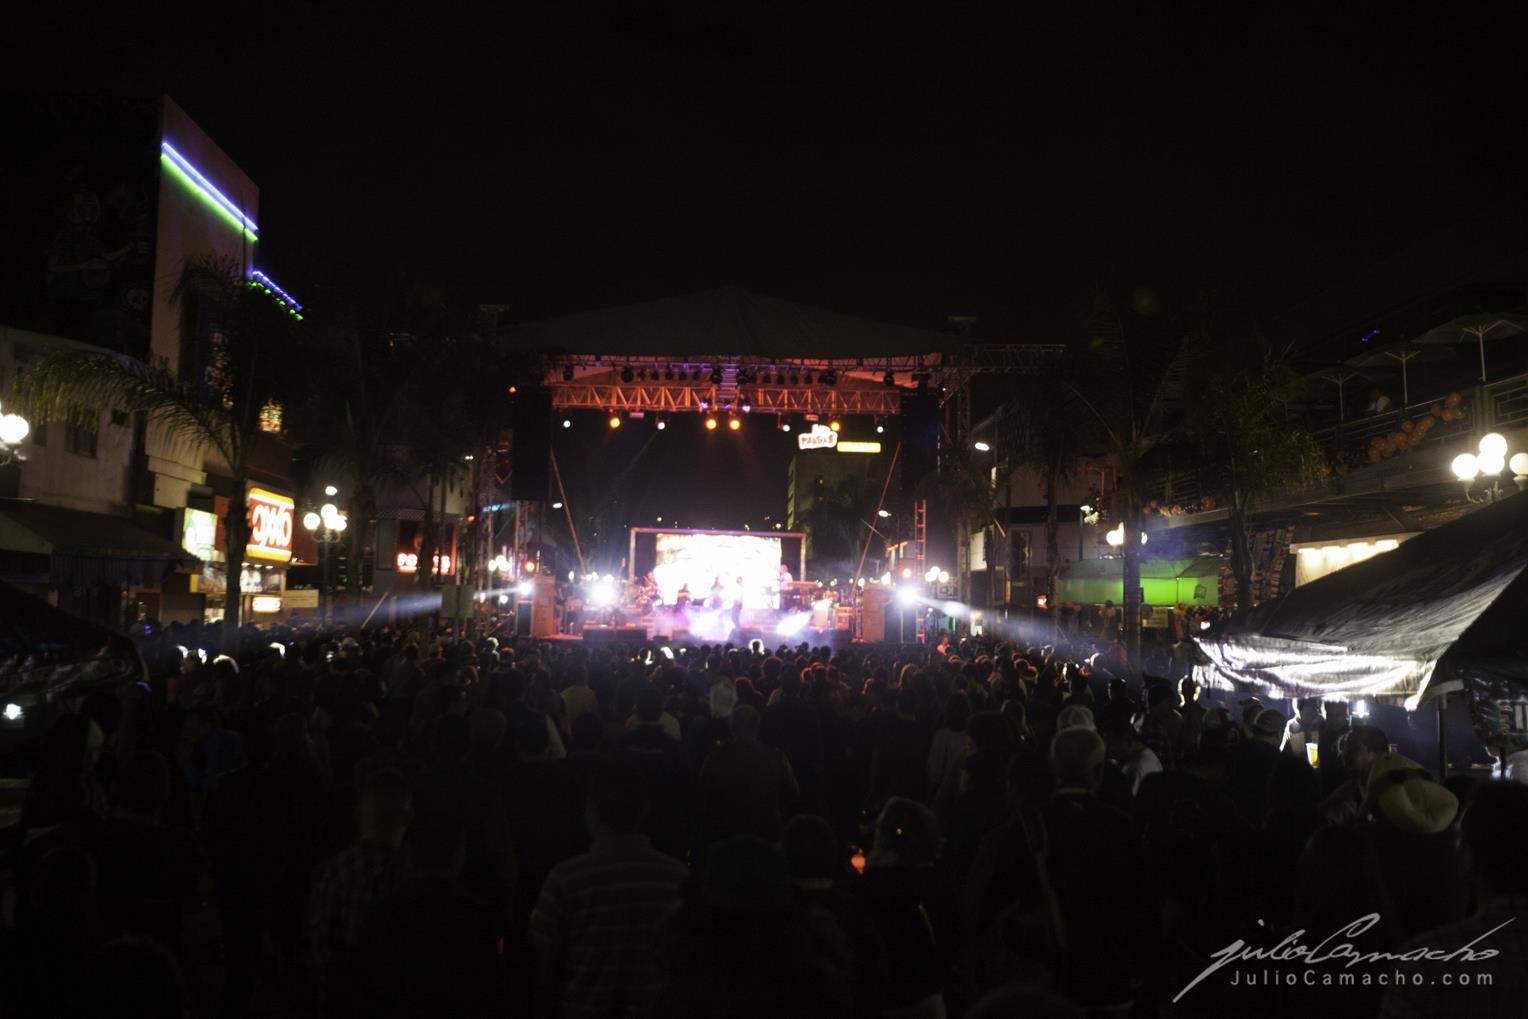 2014-10-30 31 CAST TOUR Ensenada y Tijuana - 1469 - www.Juli (Copy).jpg